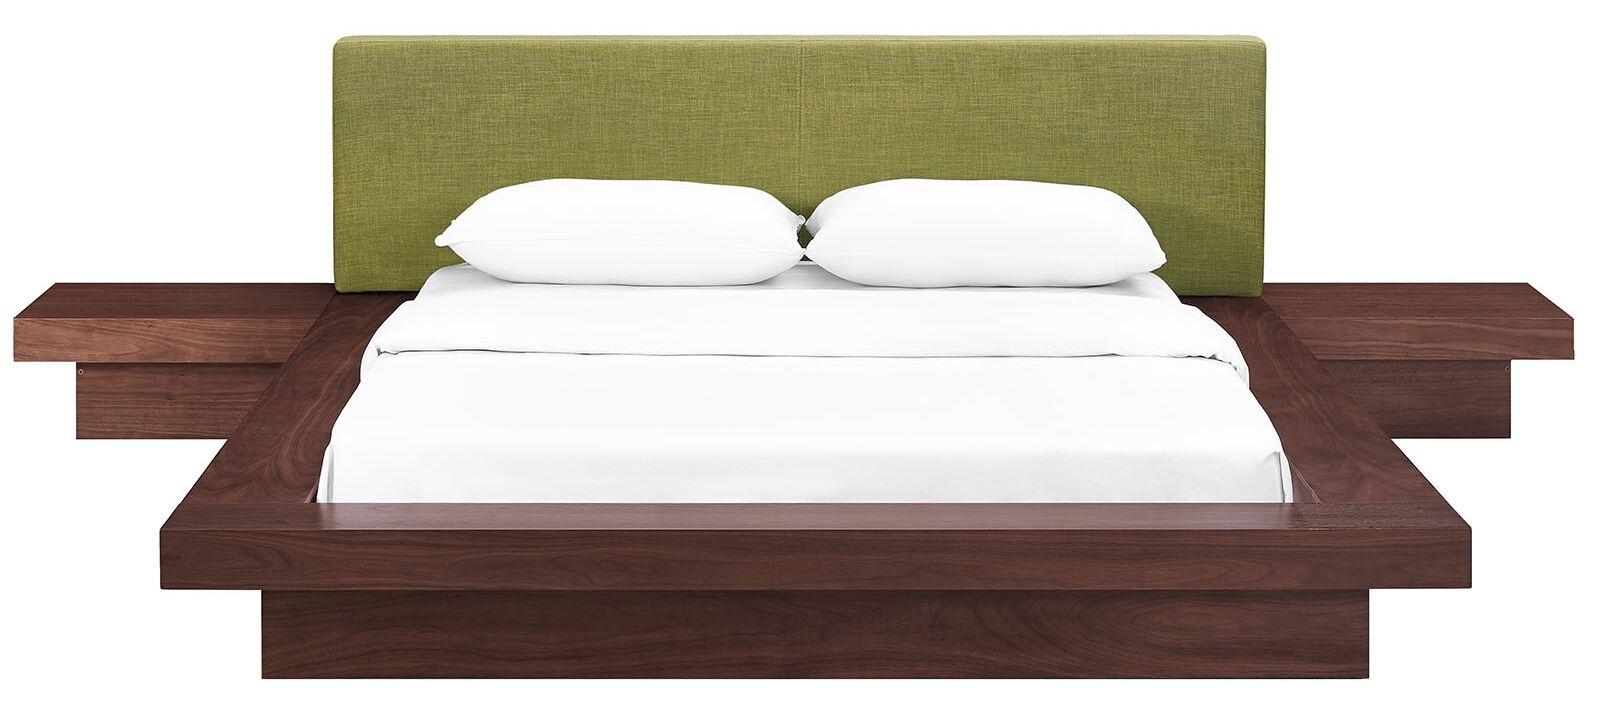 Rennan Queen Platform 3 Piece Bedroom Set Headboard Color: Green, Frame Finish: Walnut